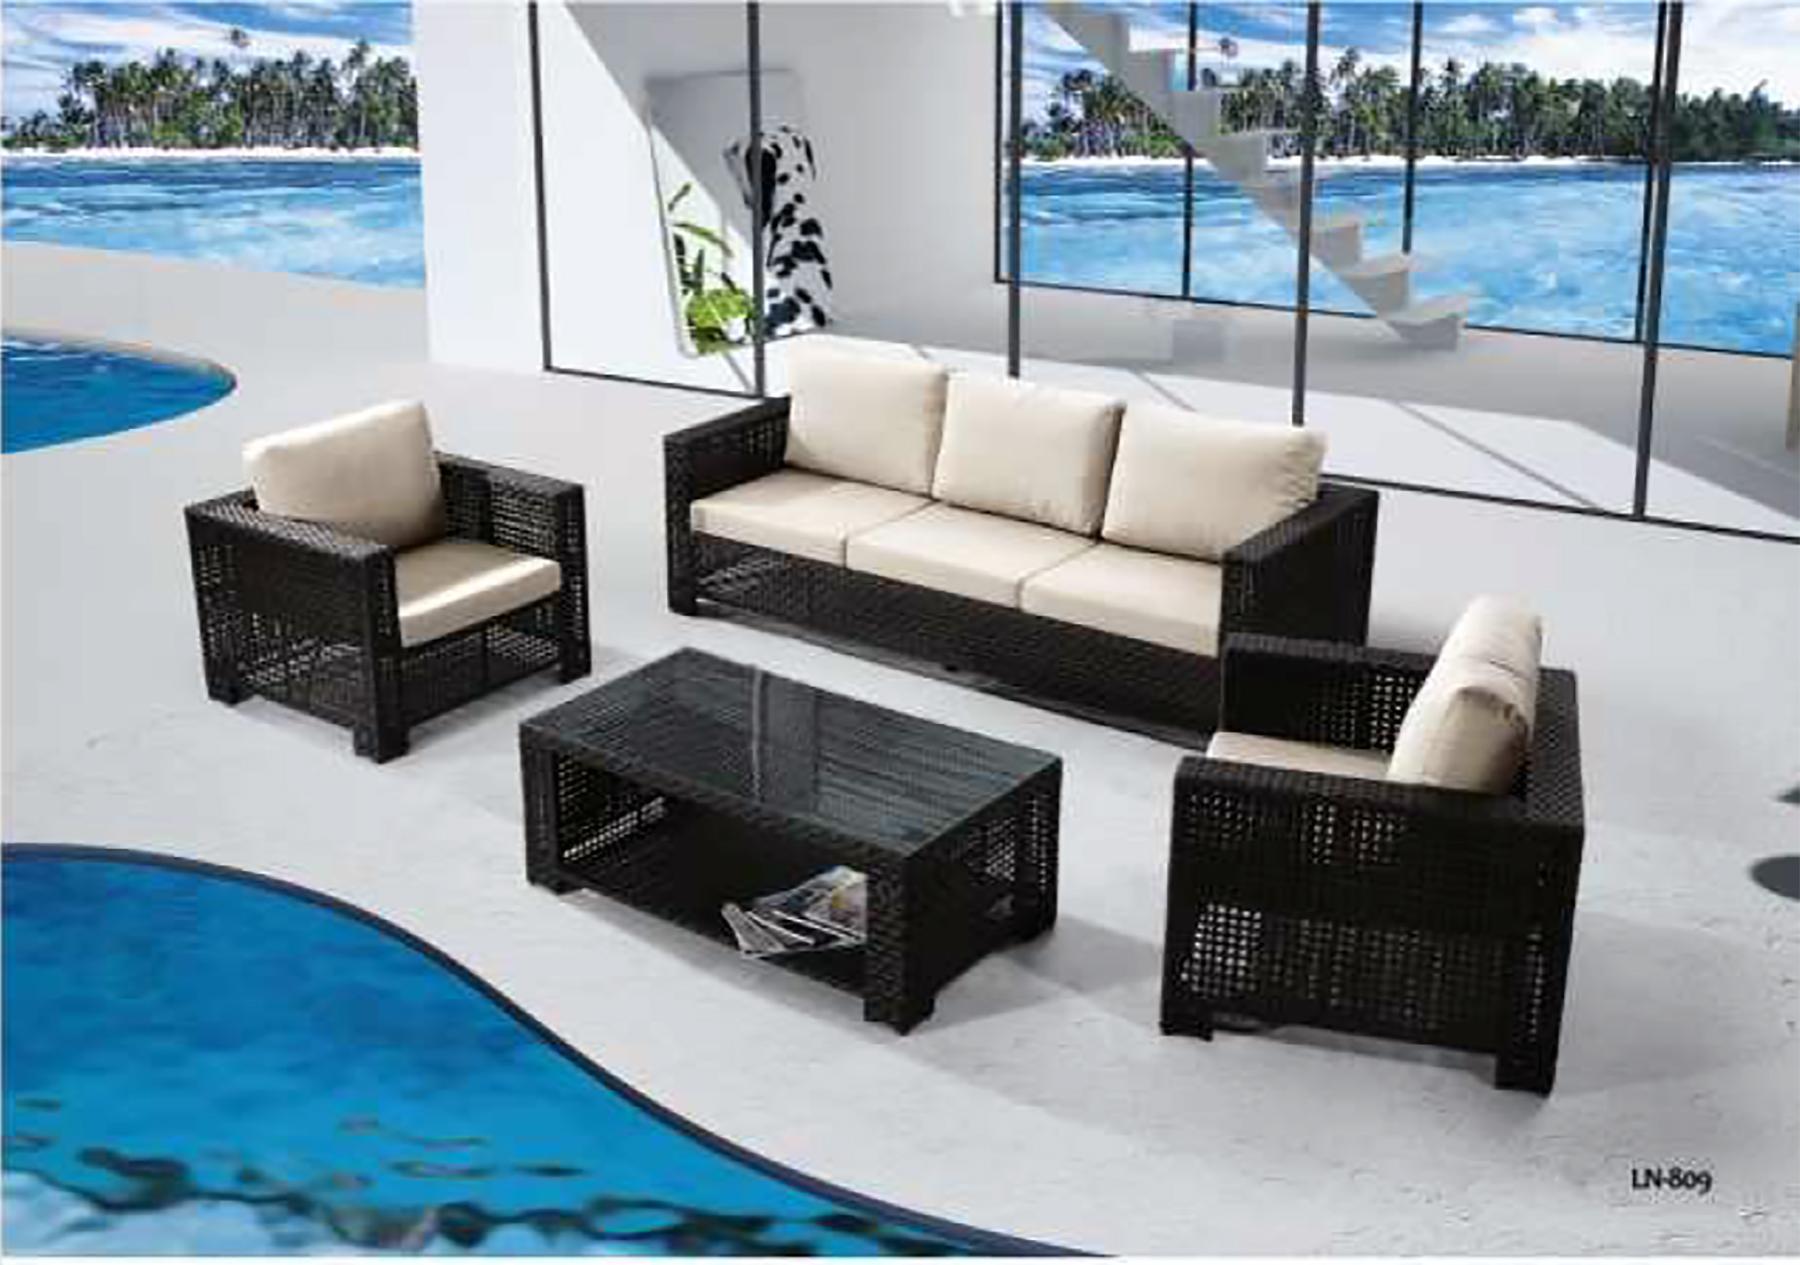 Couch set 2.jpg